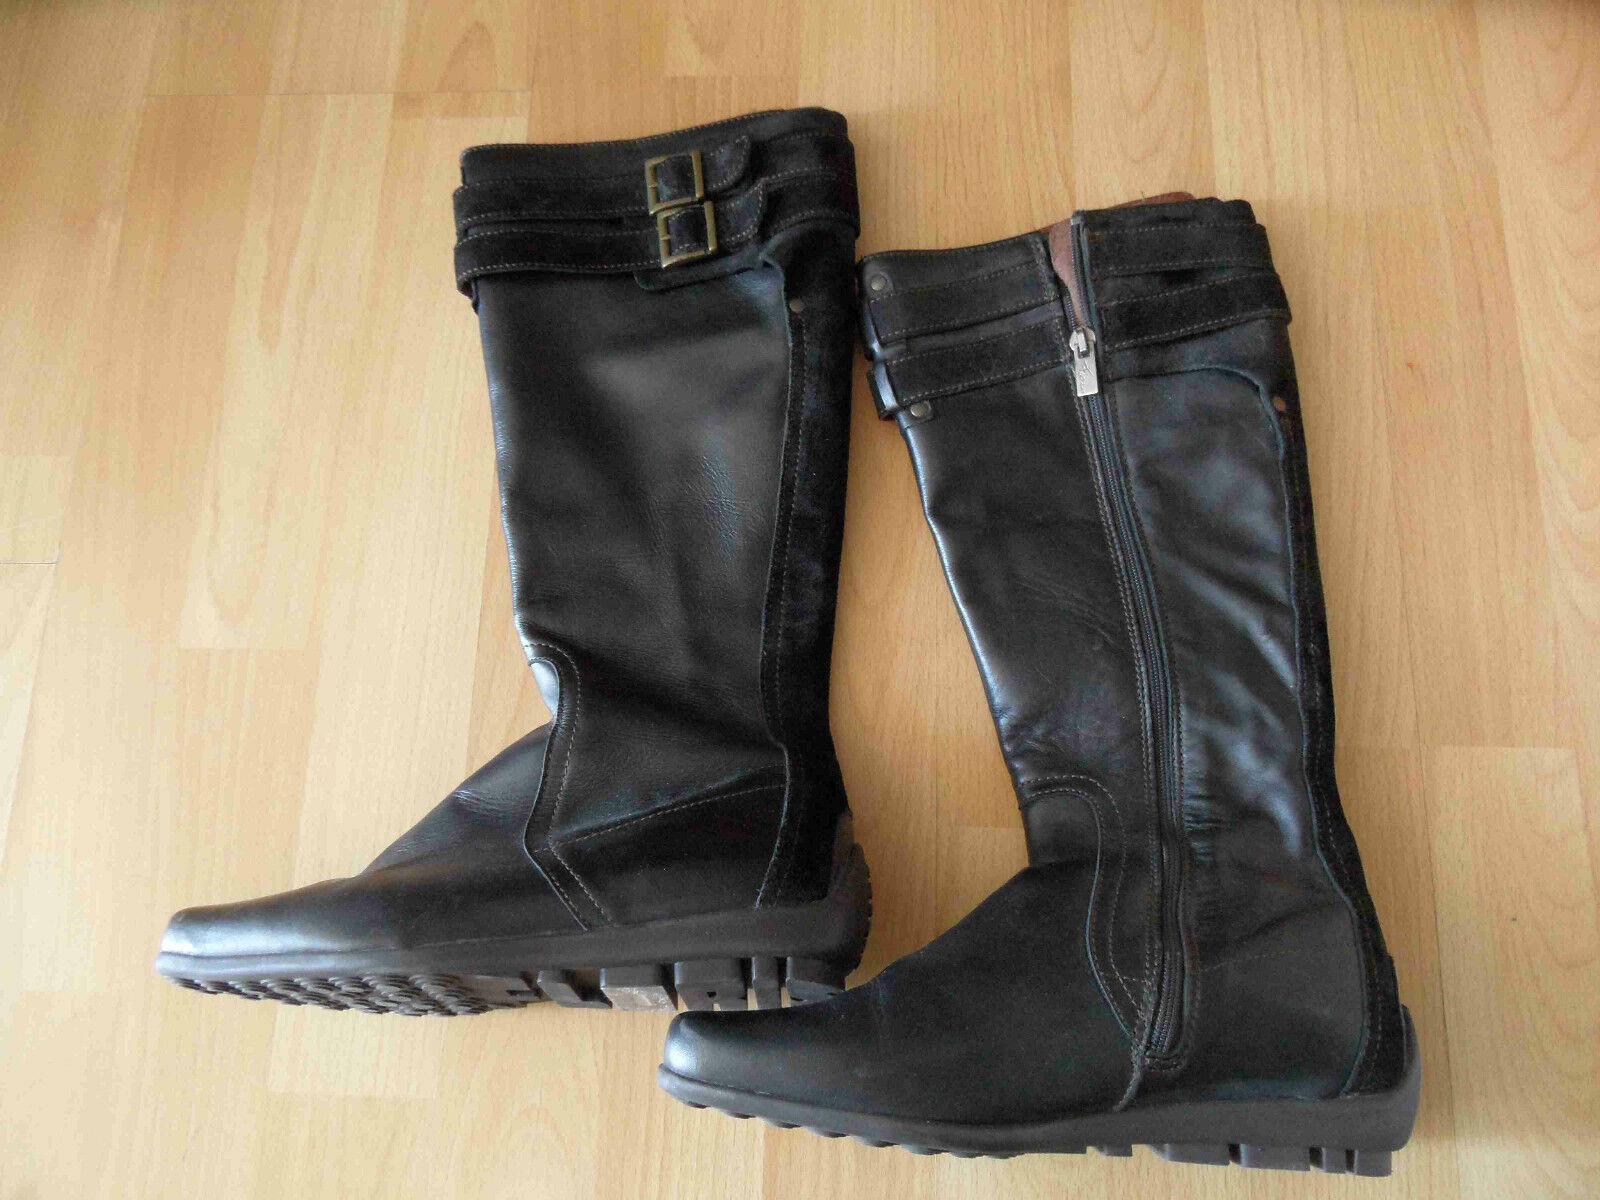 FLORIS VAN BOMMEL hochwertige hochwertige hochwertige flache Stiefel Gr. 36,5 TOP ZC316 116e35